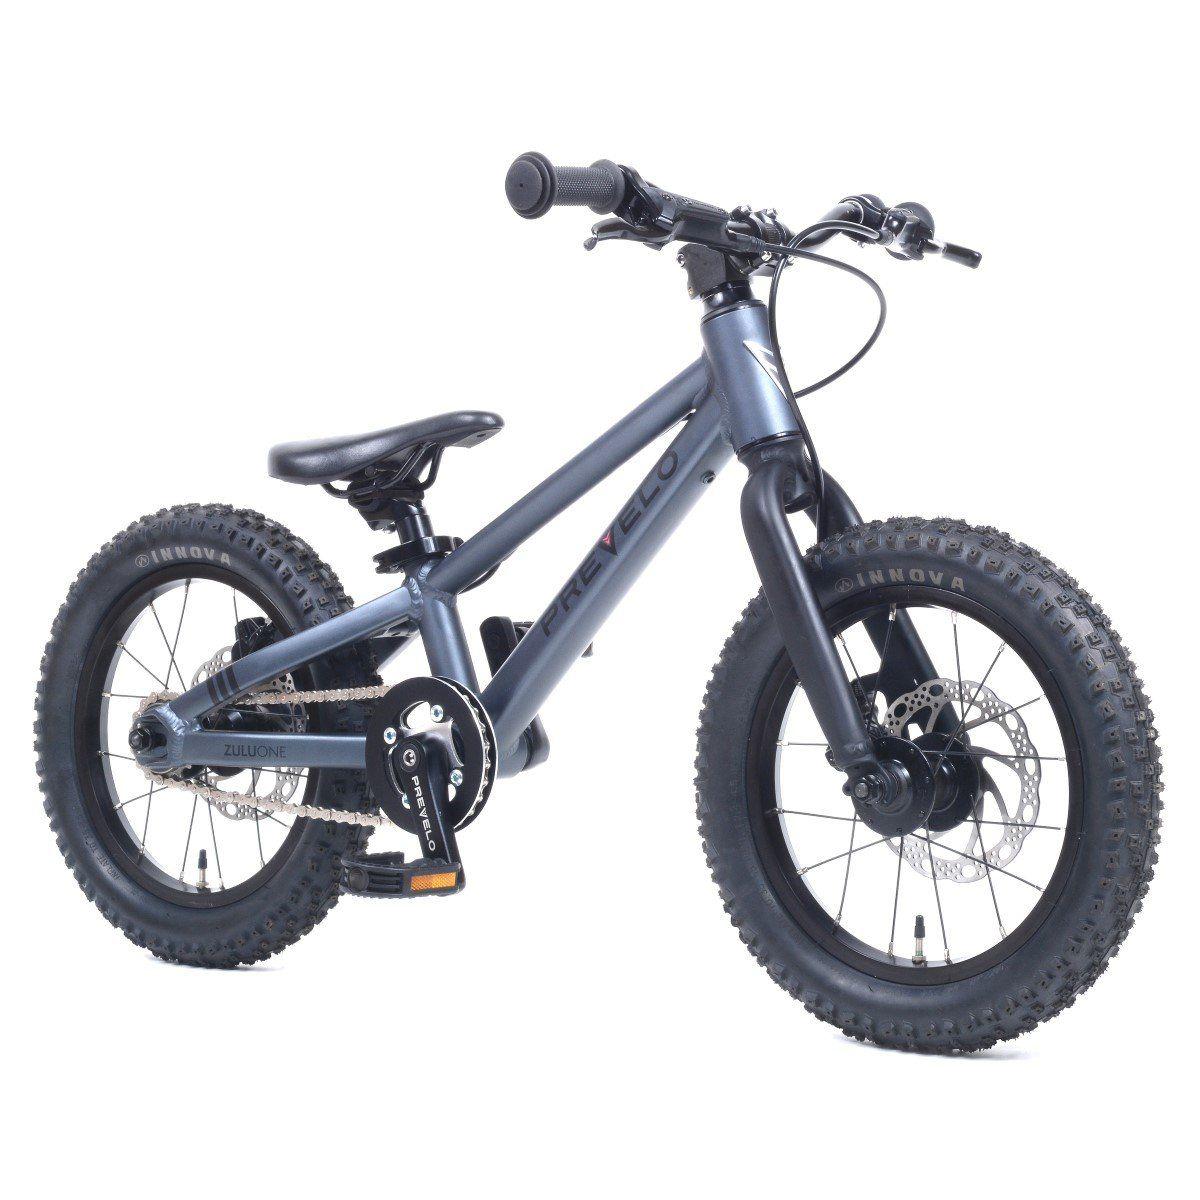 Zulu One Kids Mountain Bikes Kids Bike Kids Saddle